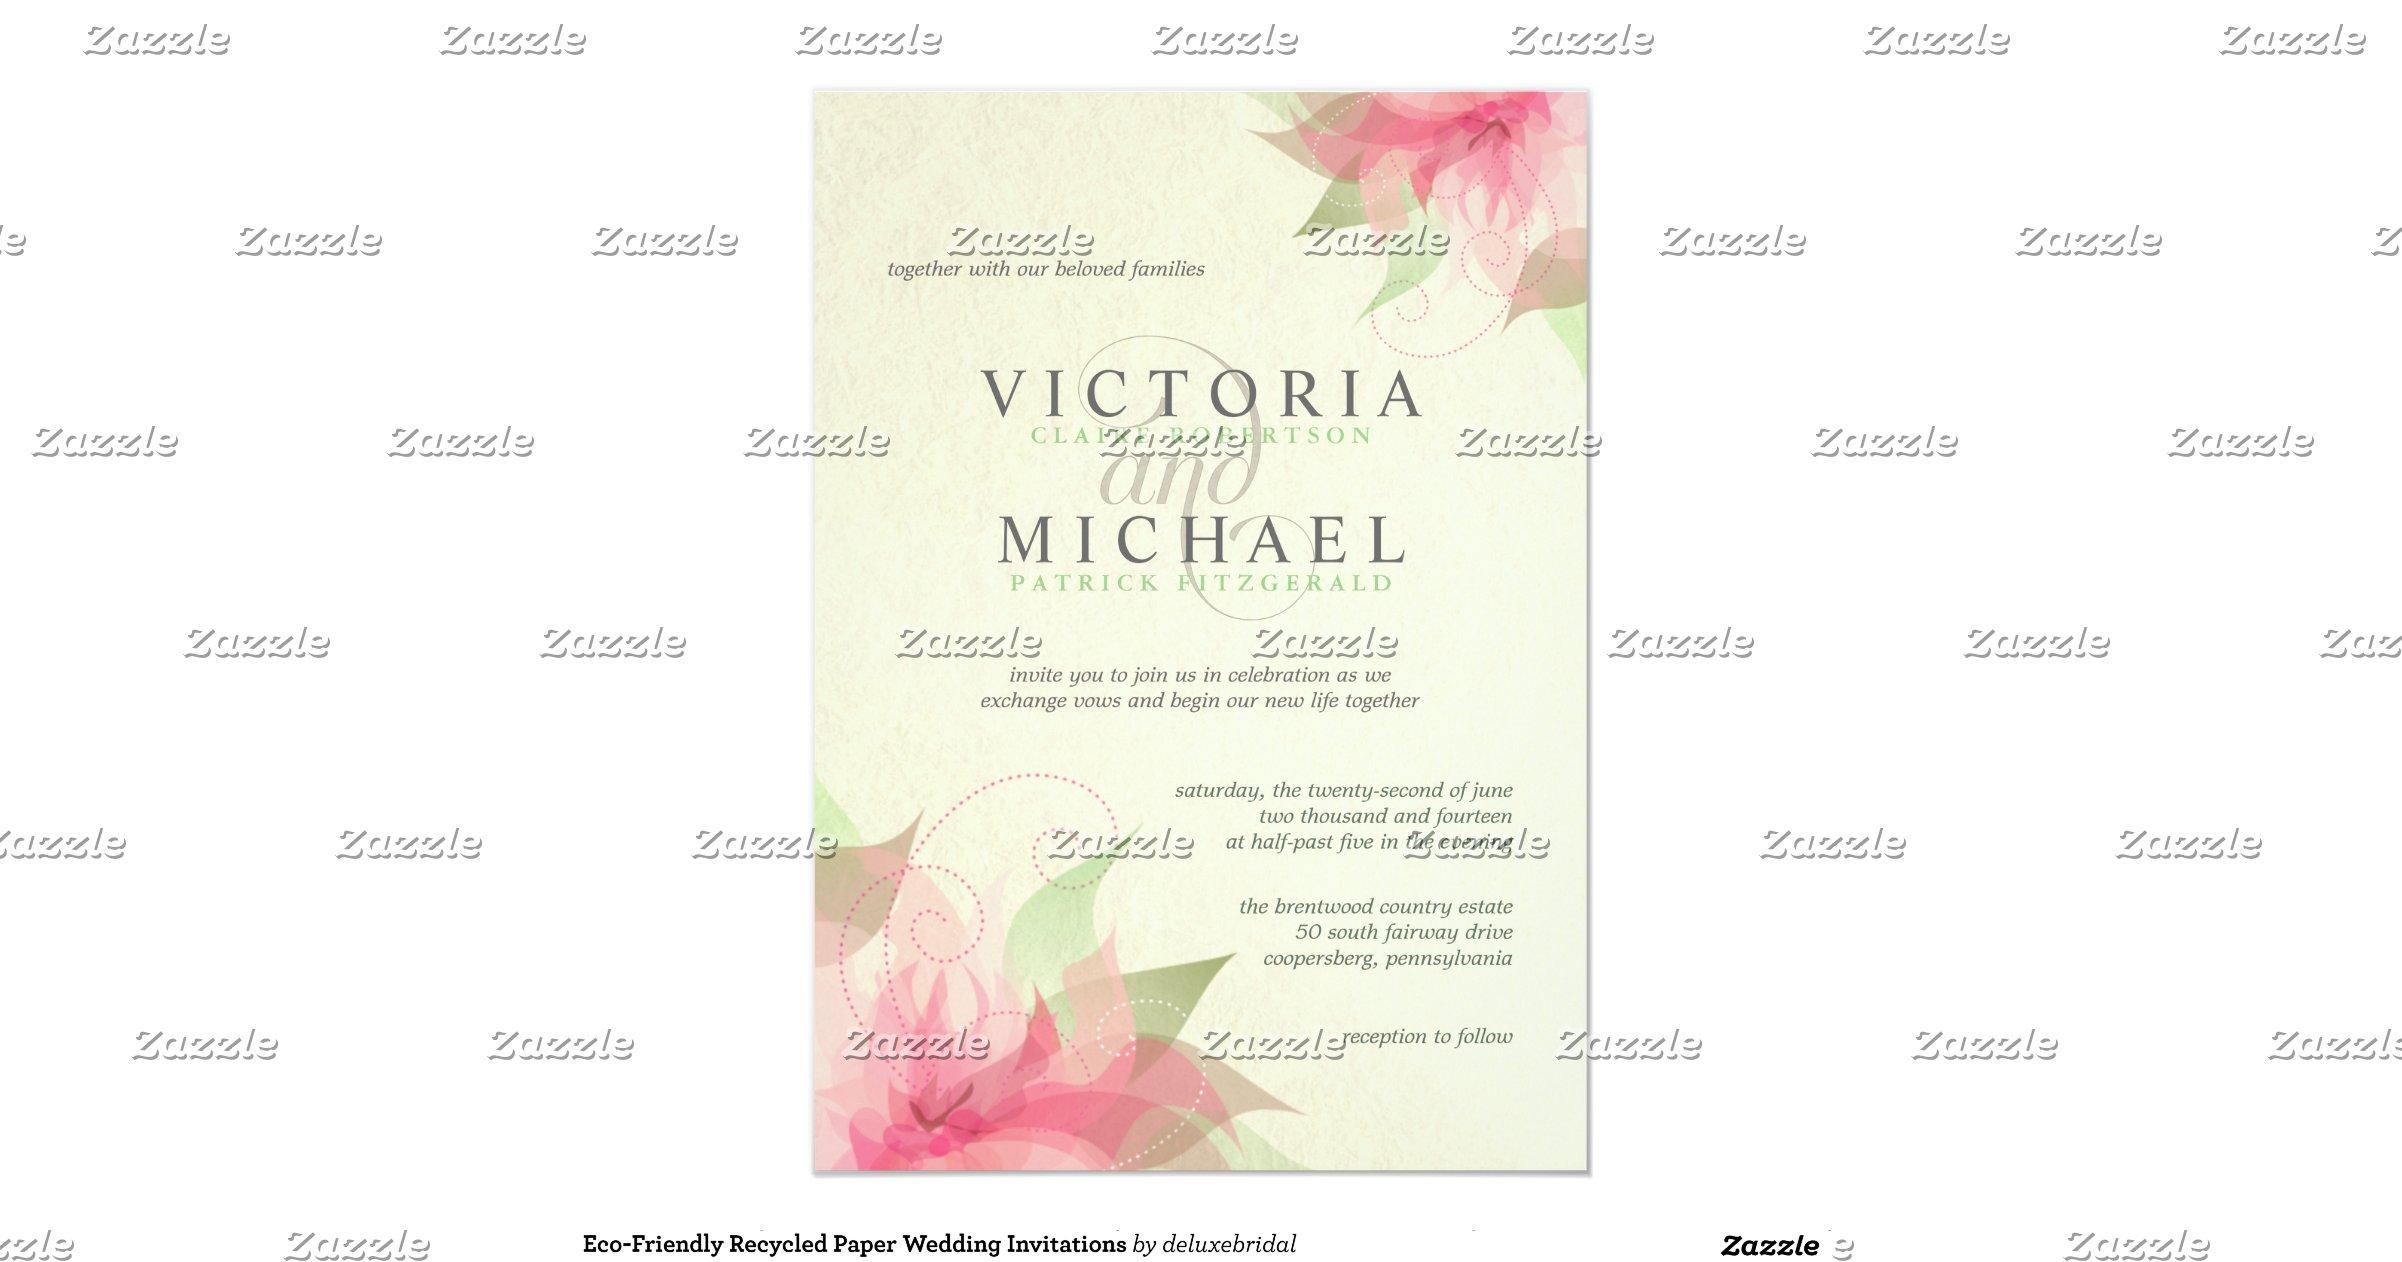 Environmentally Friendly Wedding Invitations: Eco_friendly_recycled_paper_wedding_invitations